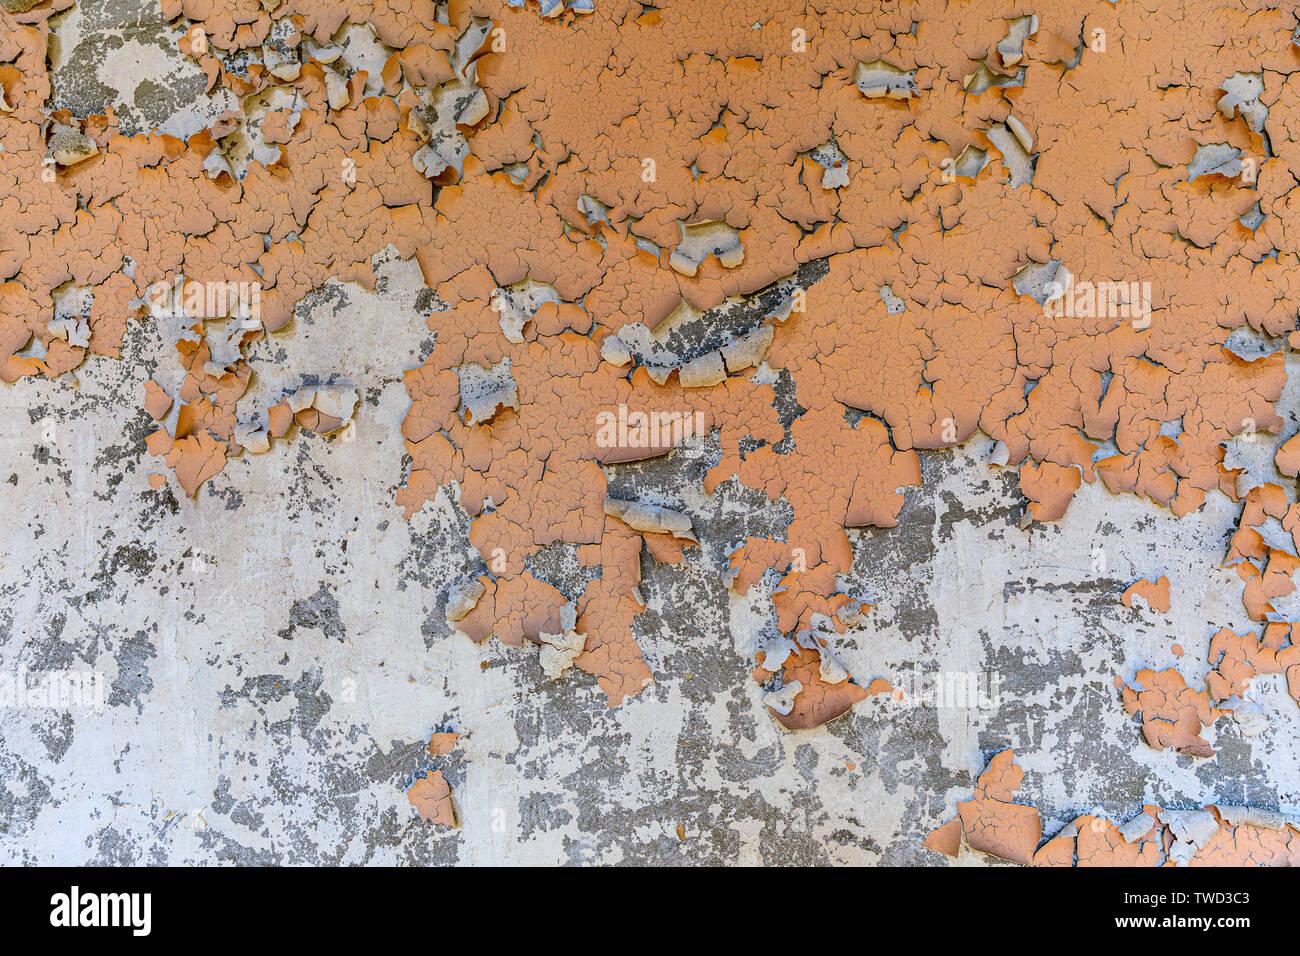 Eastern Europe, Ukraine, Pripyat, Chernobyl. Peeling paint . - Stock Image